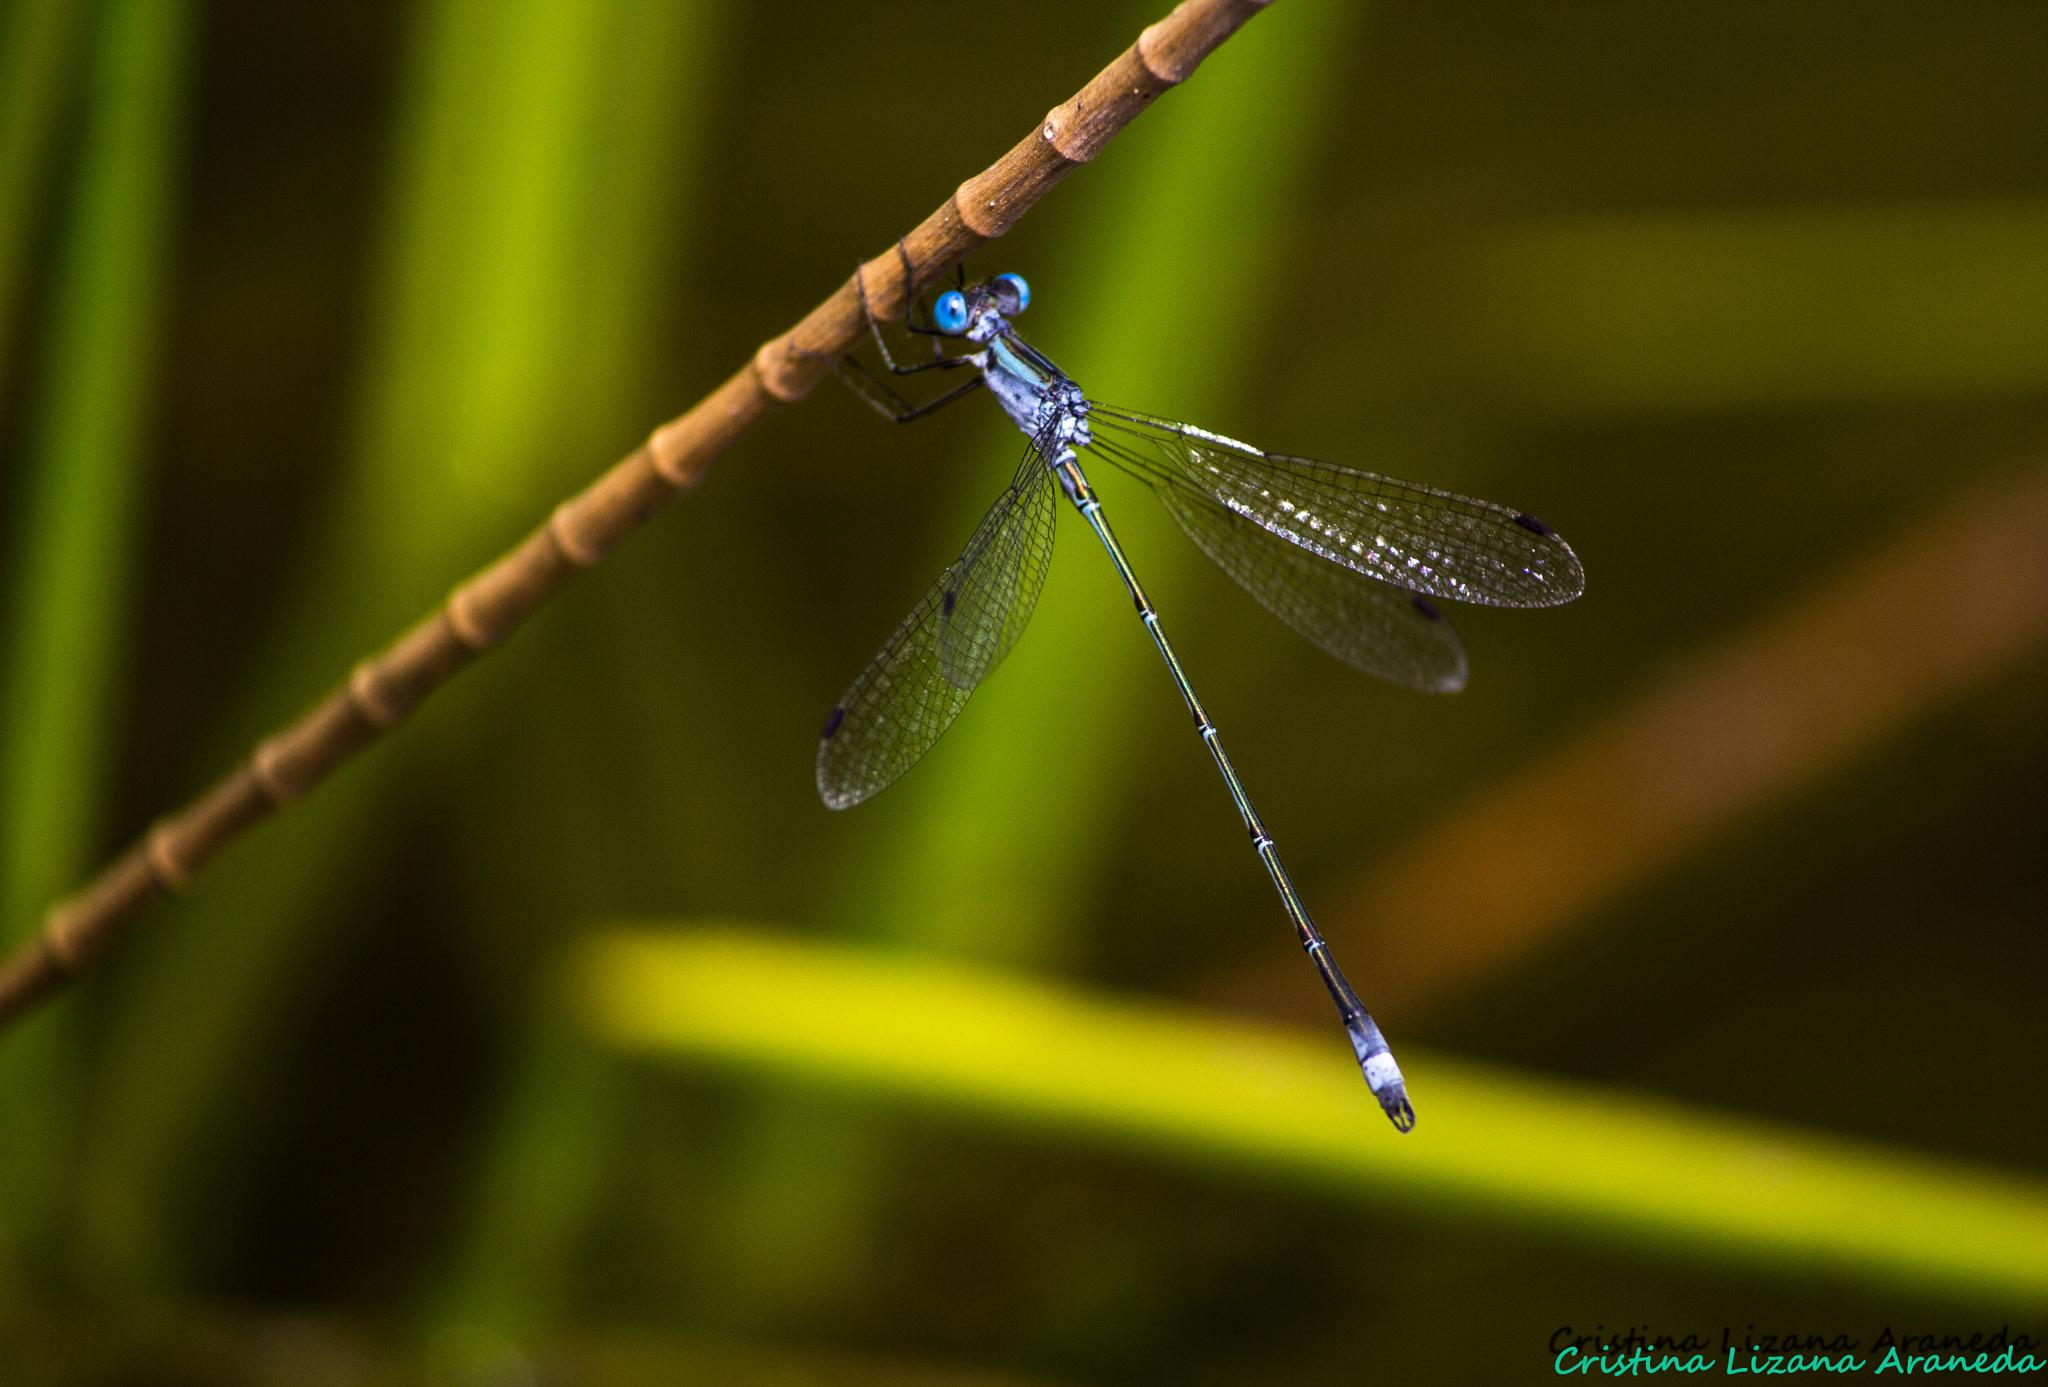 Blue dragonfly by Cristina Lizana